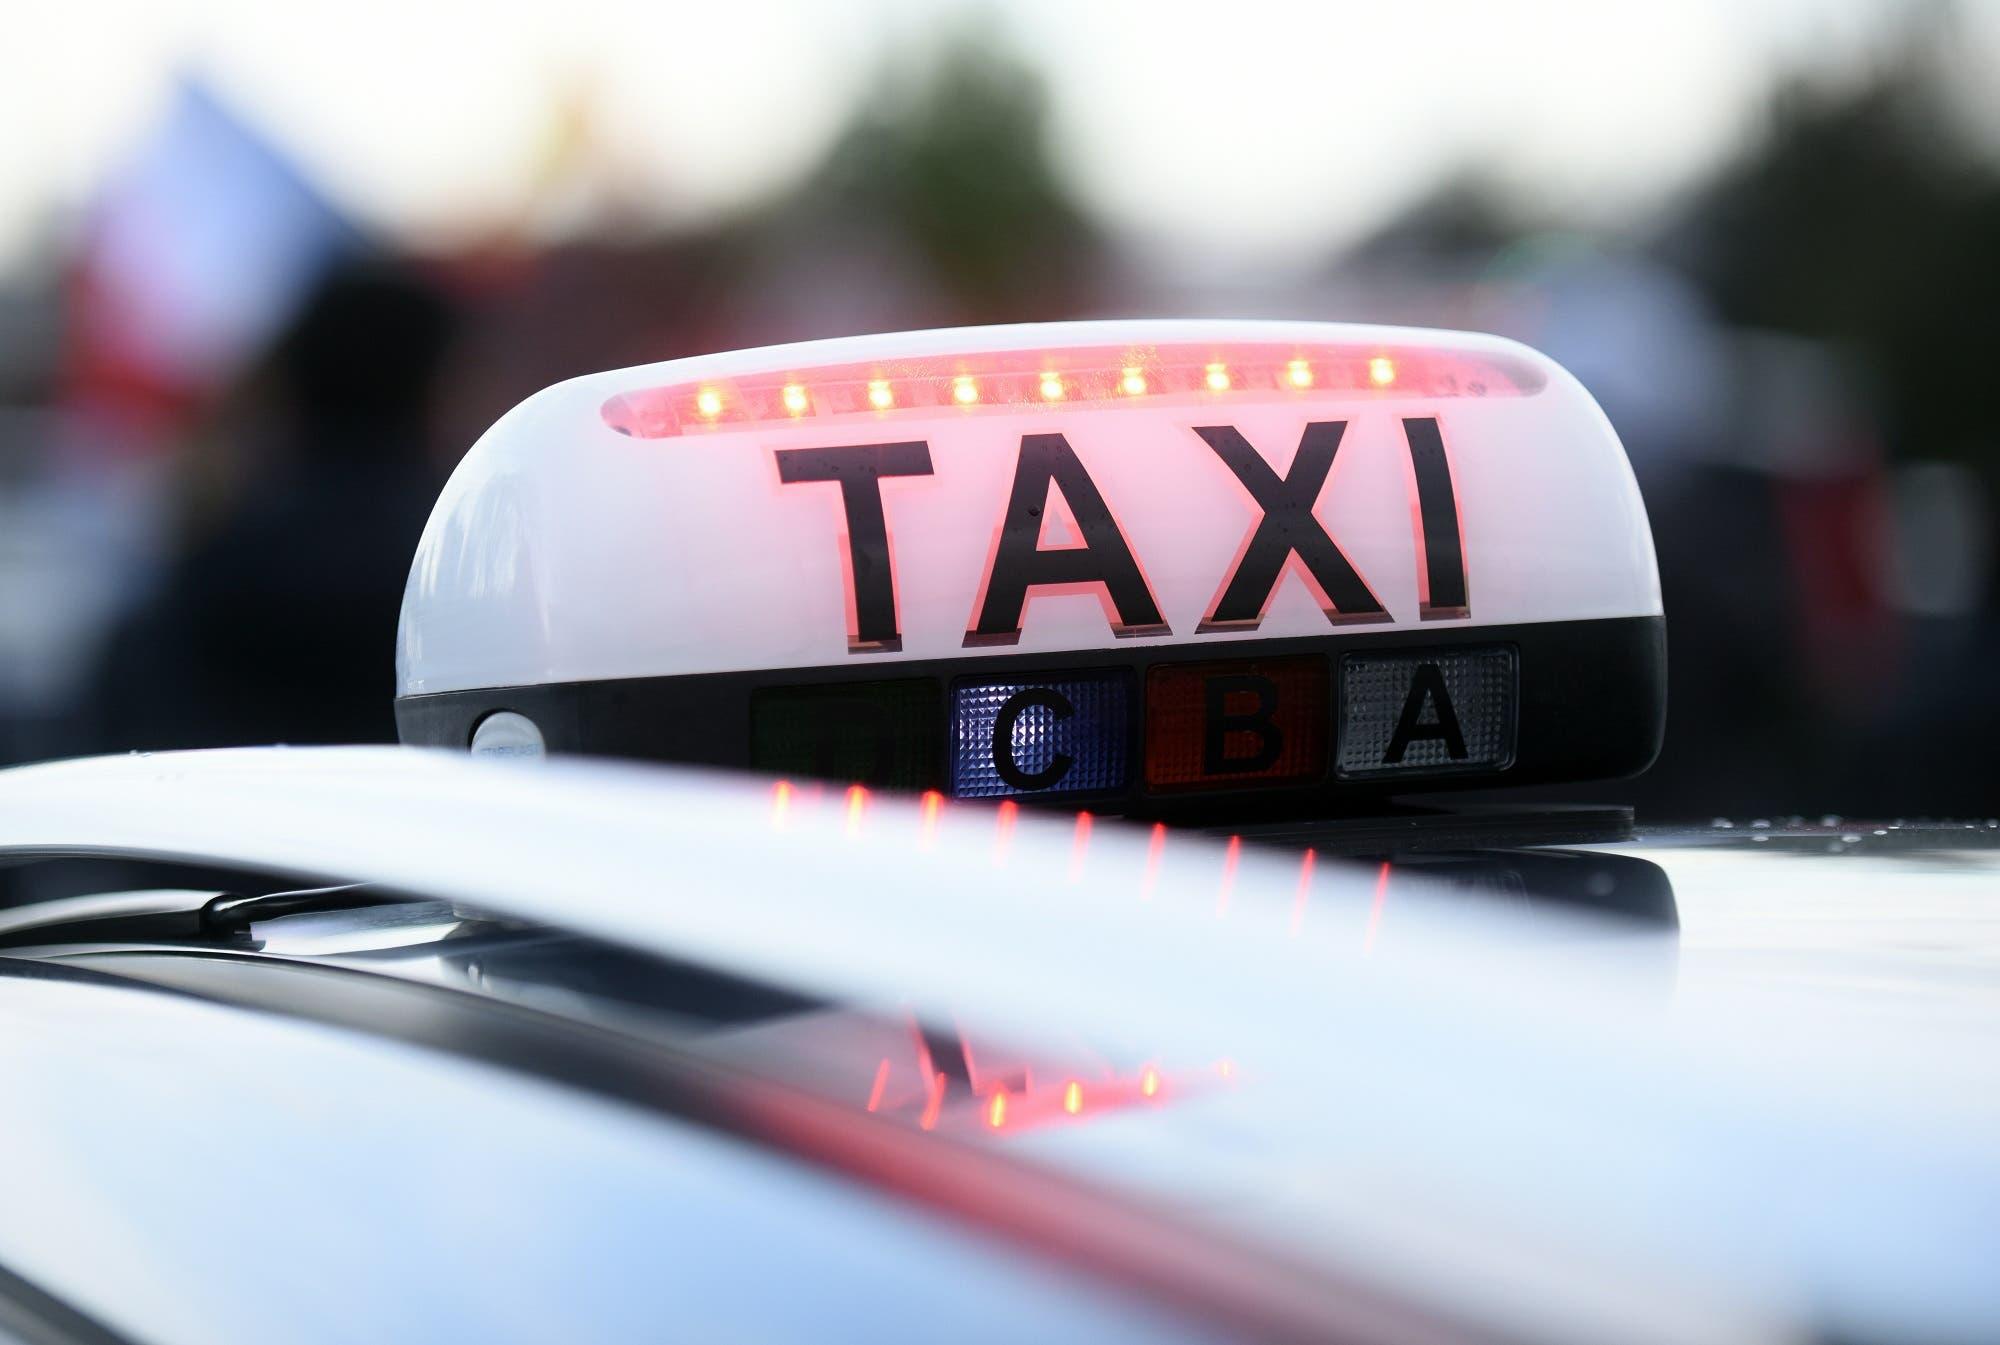 Taxi in Lebanon. (File photo: AFP)